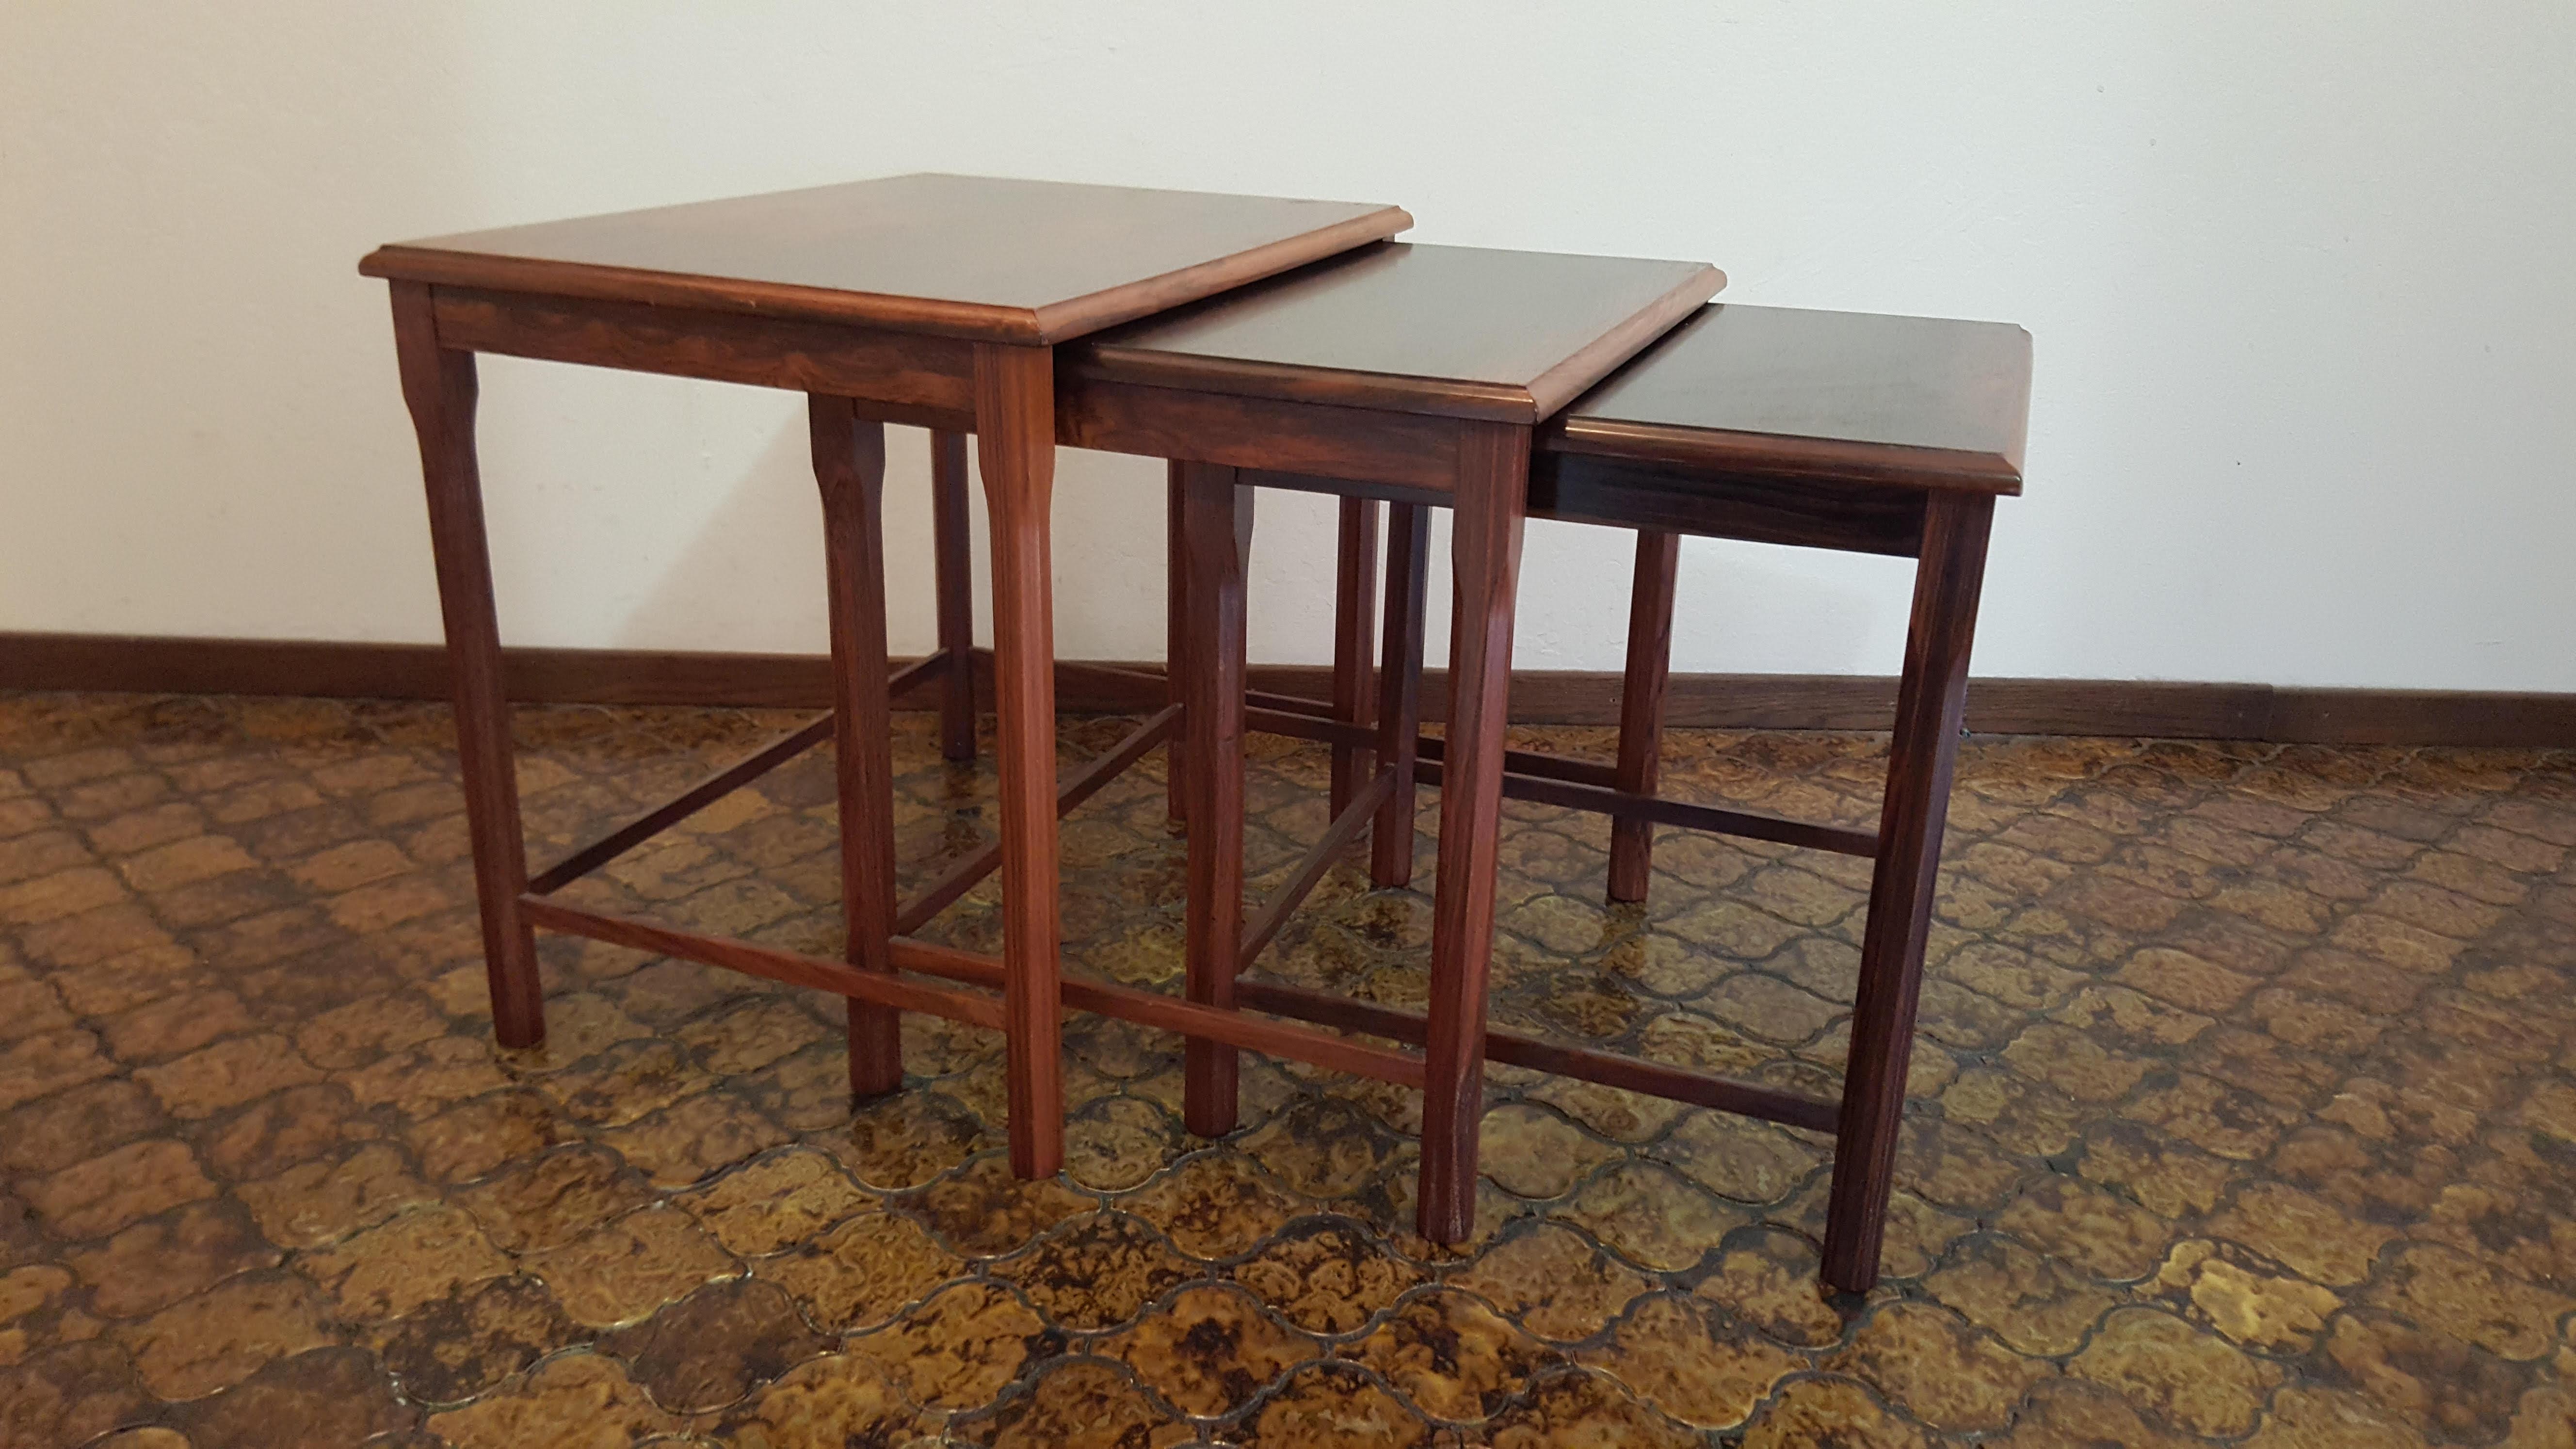 Toften Mobelfabrik Vintage Danish Nesting Tables   Set Of 3   Image 2 Of 11